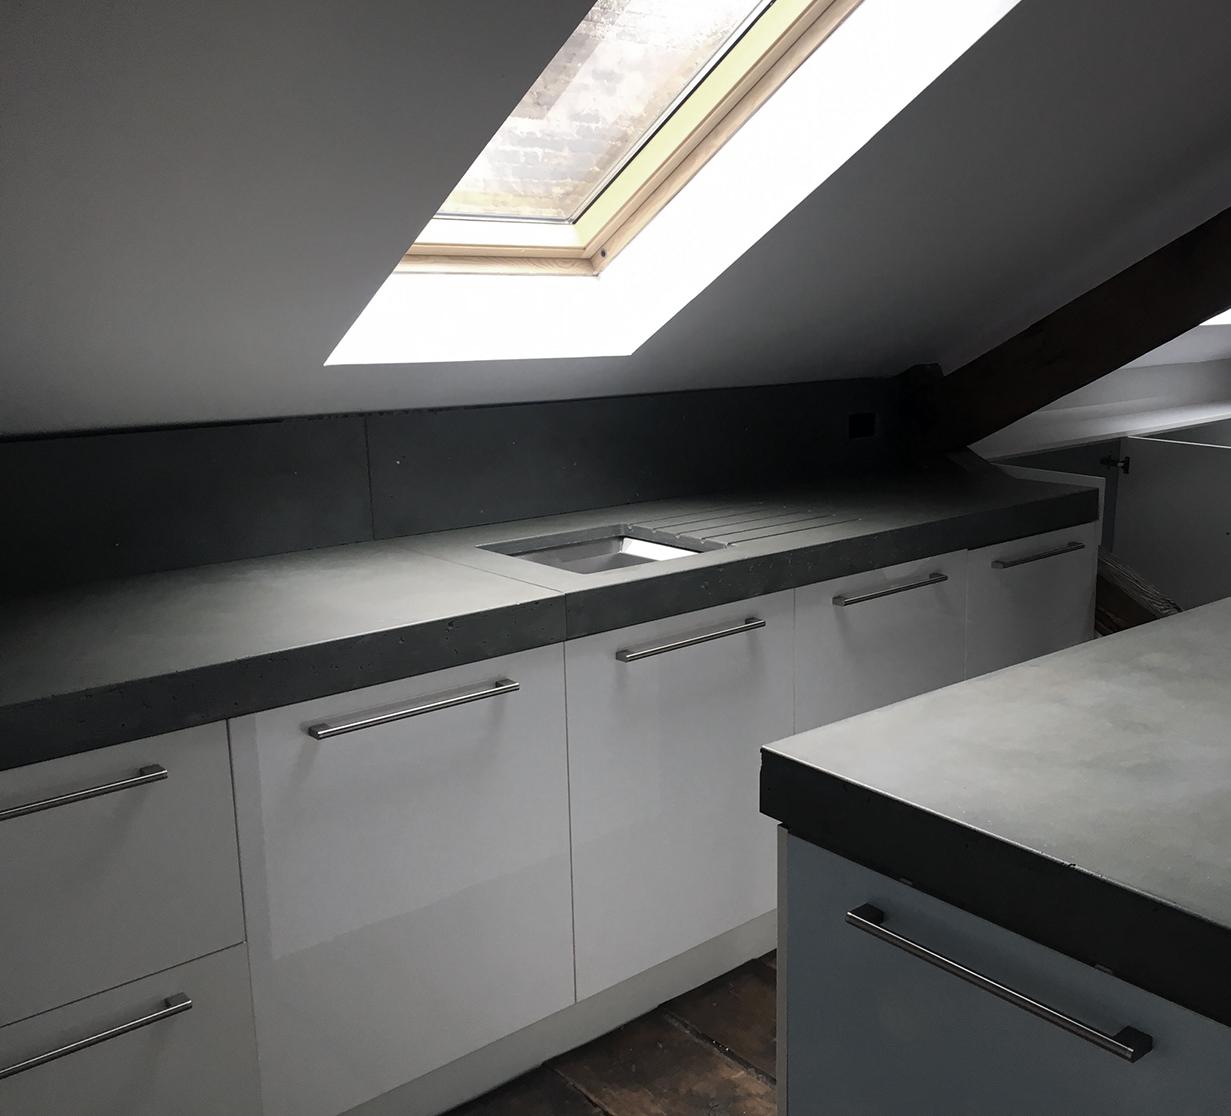 Concrete-worktops-polished.jpg